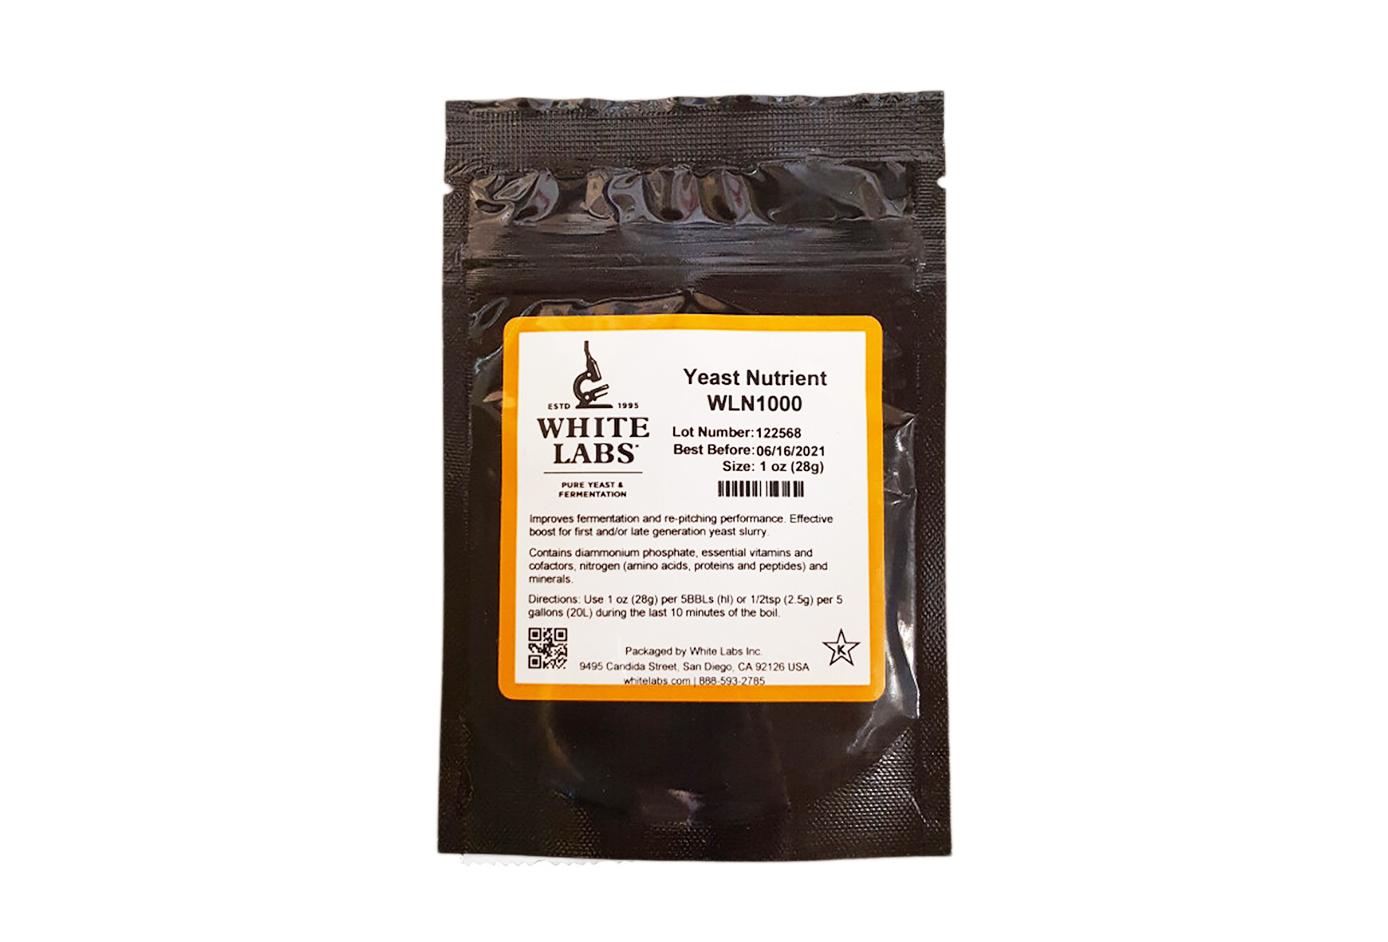 WLN1000 Yeast Nutrient